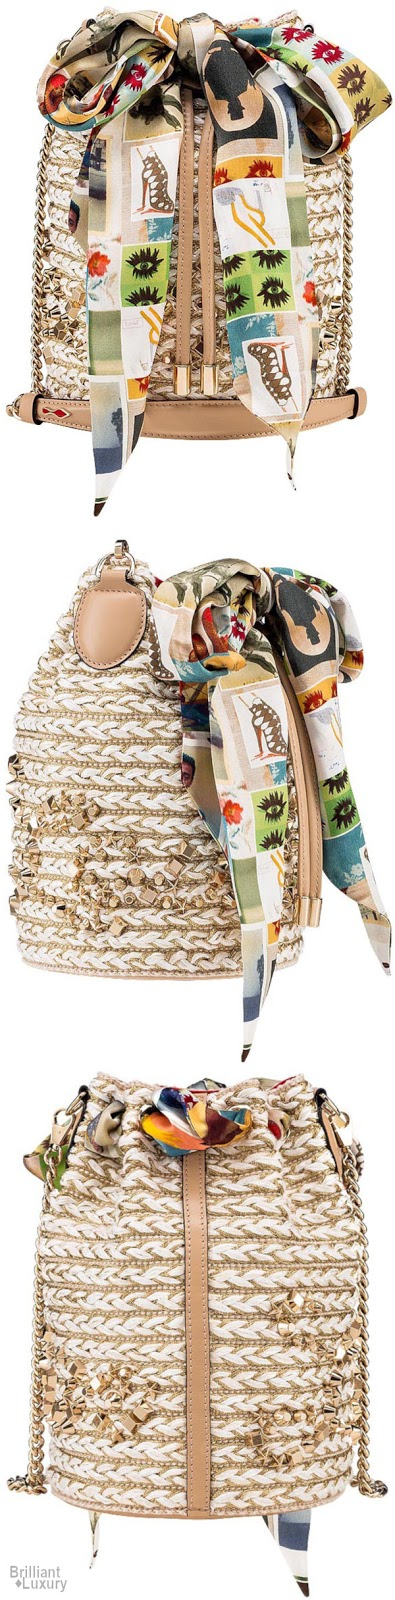 Brilliant Luxury♦Christian Louboutin Marie Jane bucket bag